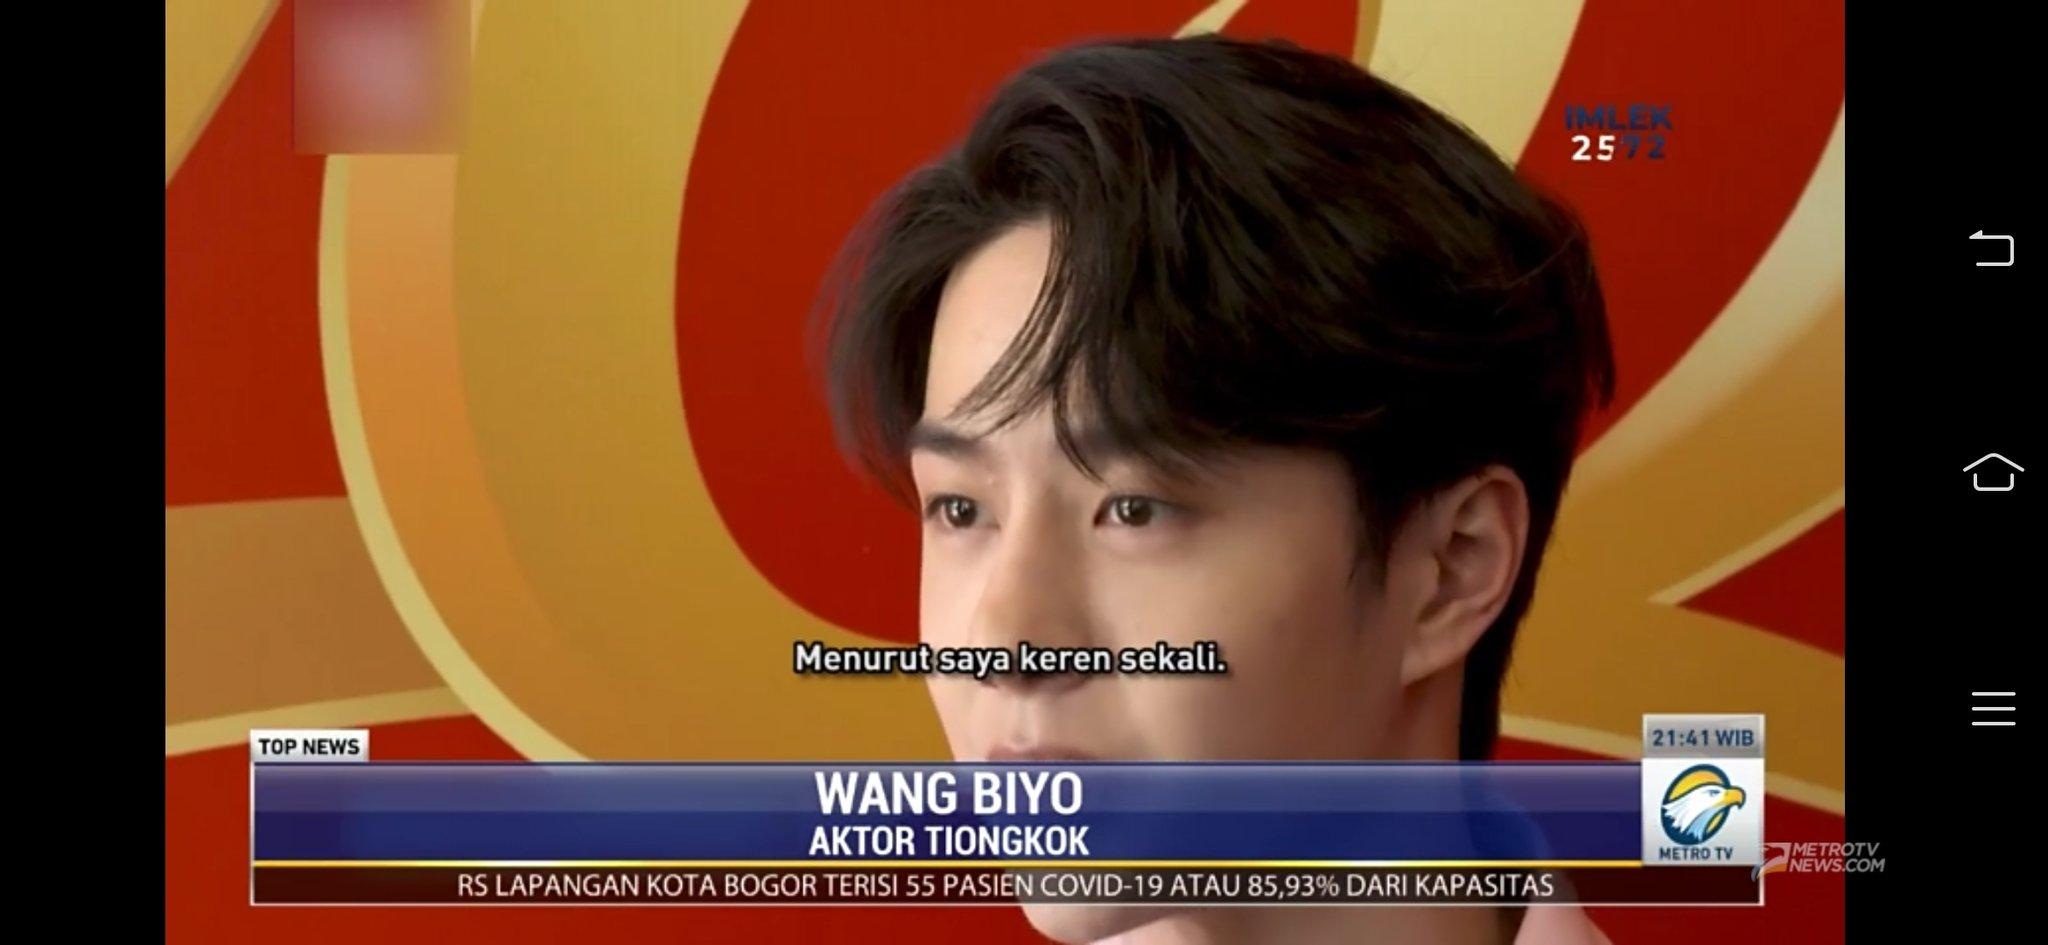 wang yibo metro tv